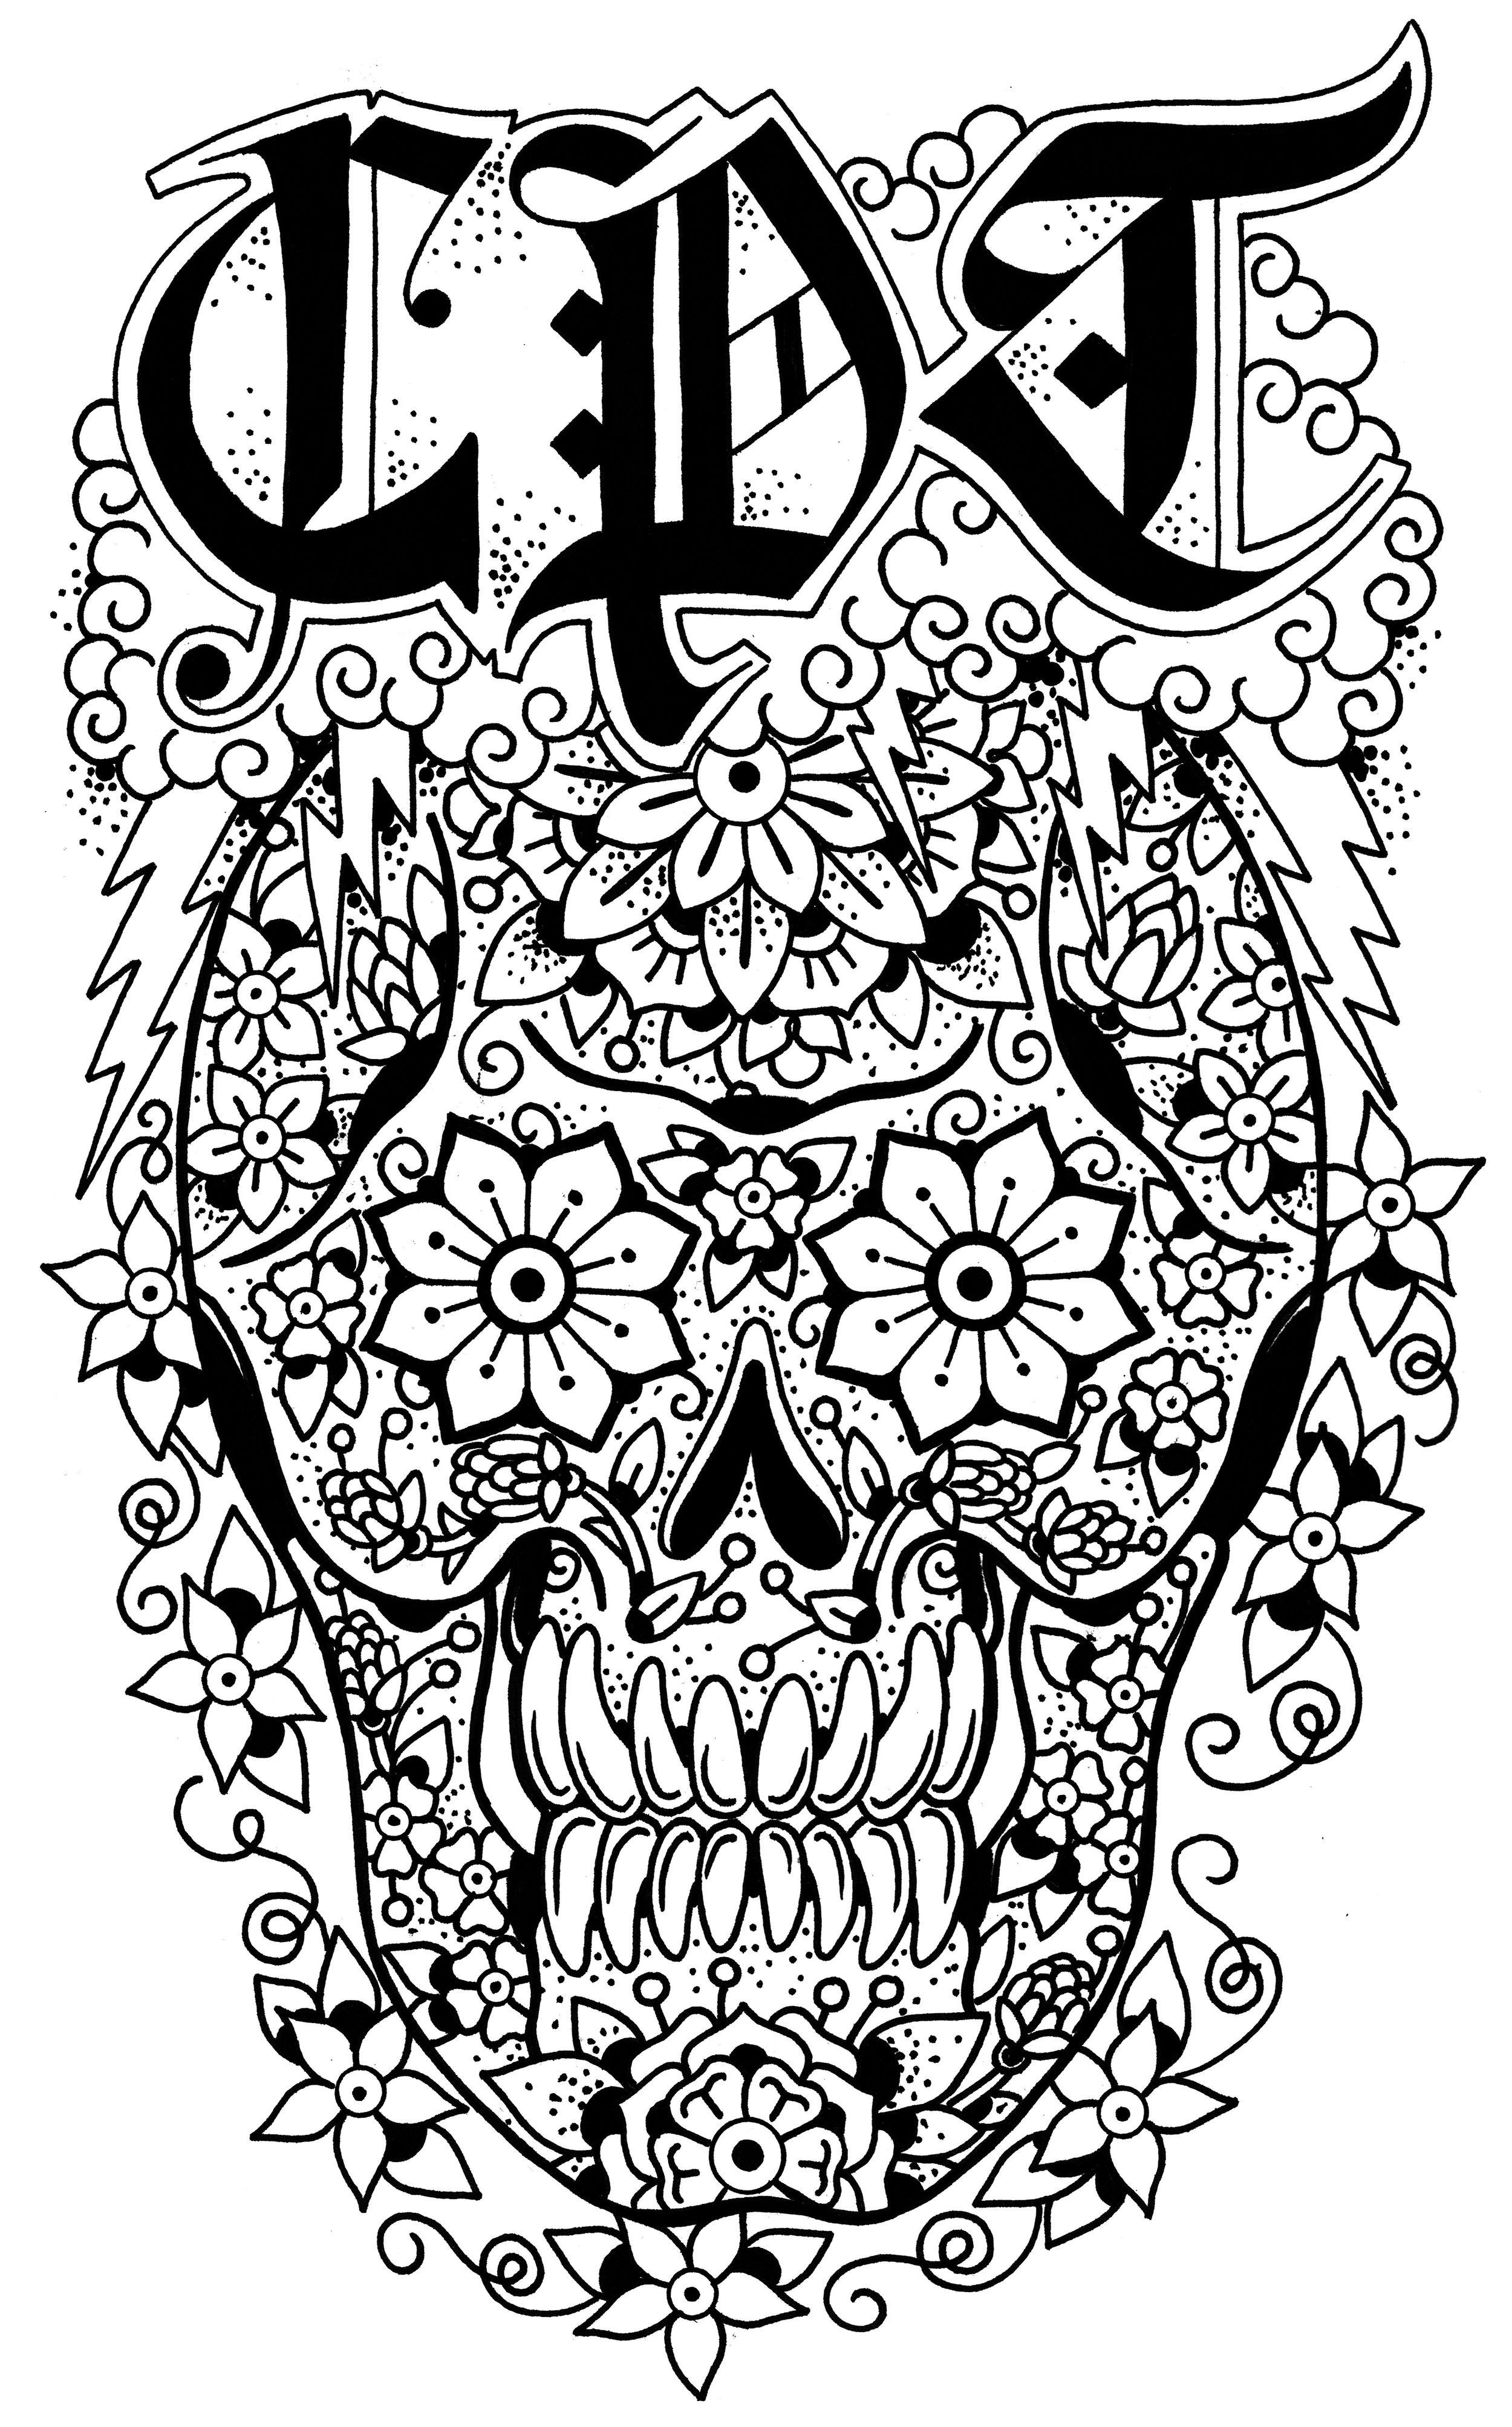 Cambridge Tattoo Parlour